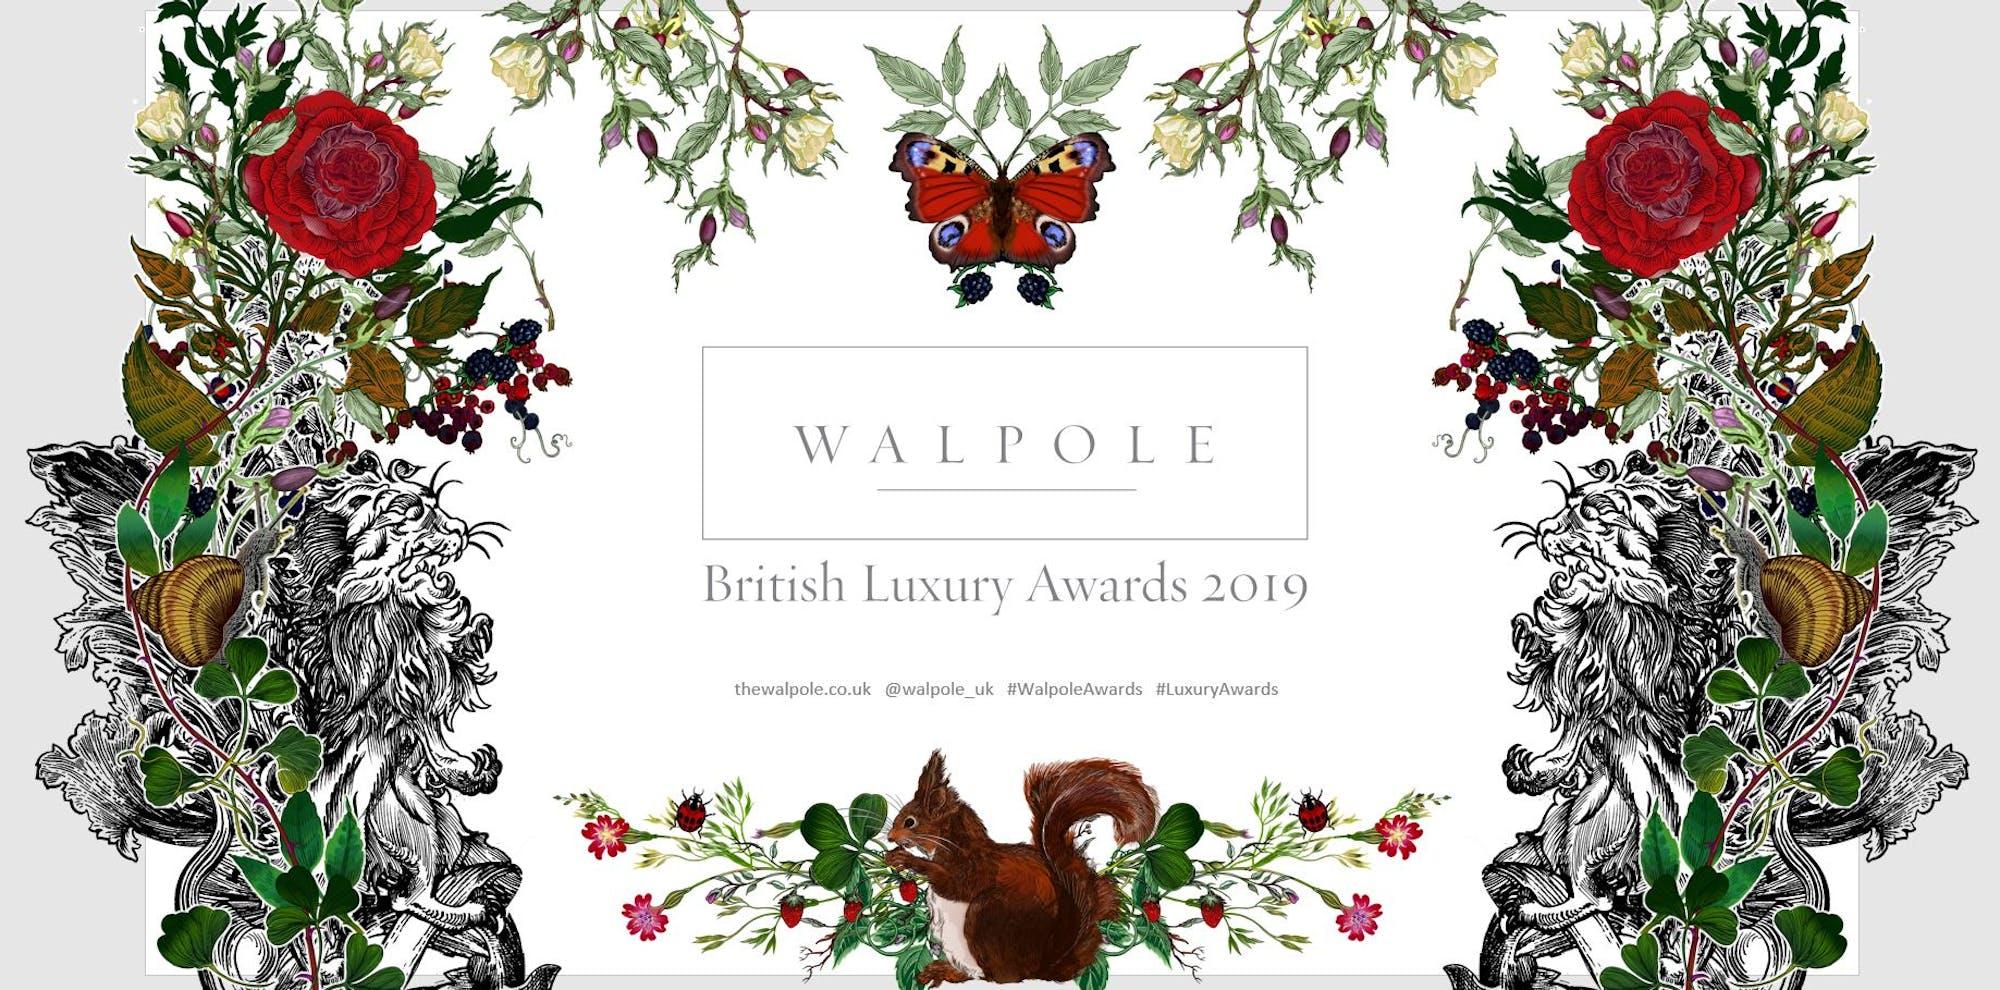 Walpole British Luxury Awards 2019  The Winners